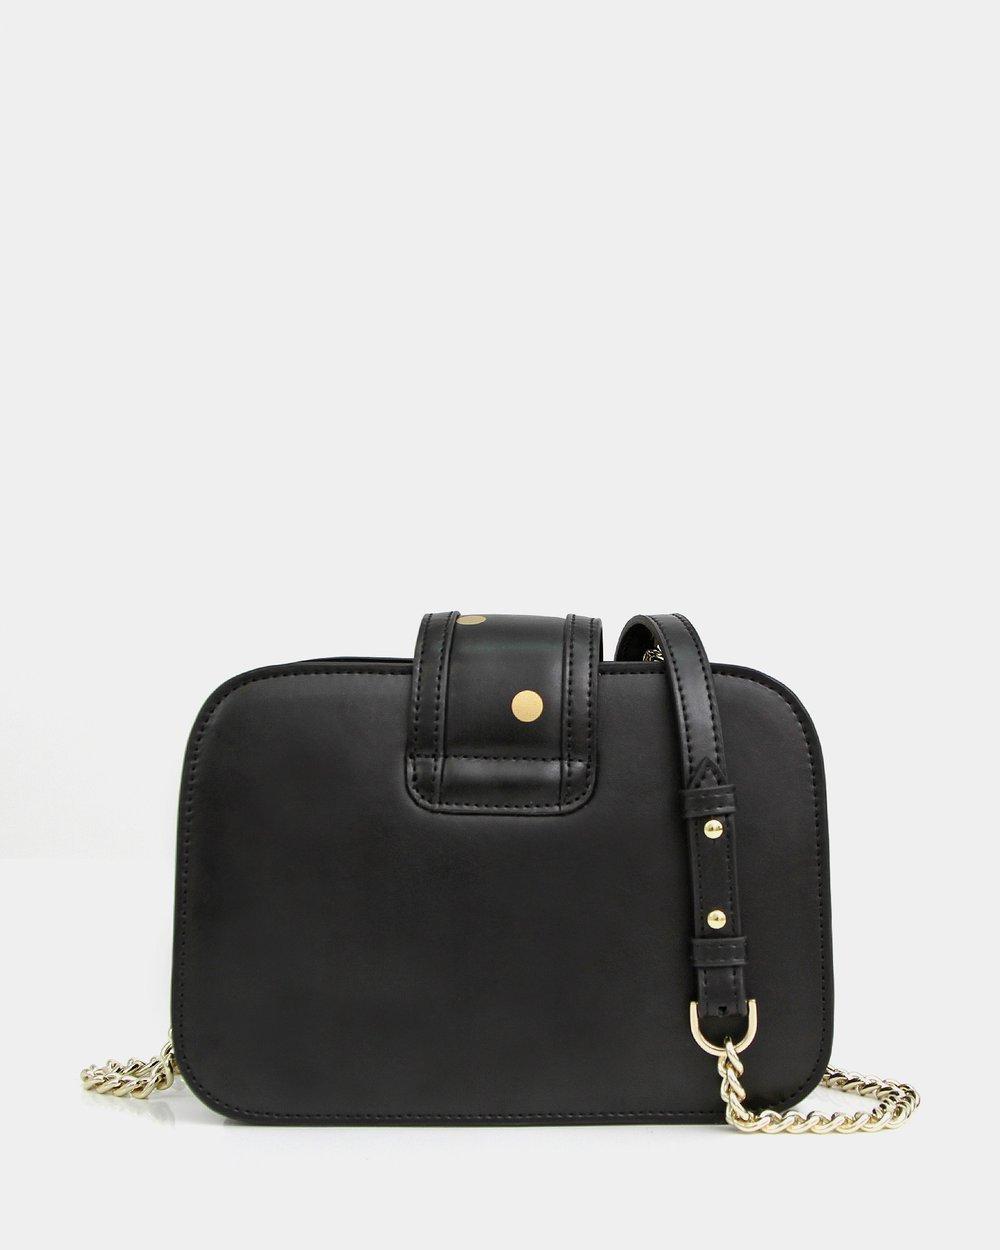 6409ba196 Belle Fleur Leather Cross-Body Bag by Belle & Bloom Online | THE ICONIC |  Australia